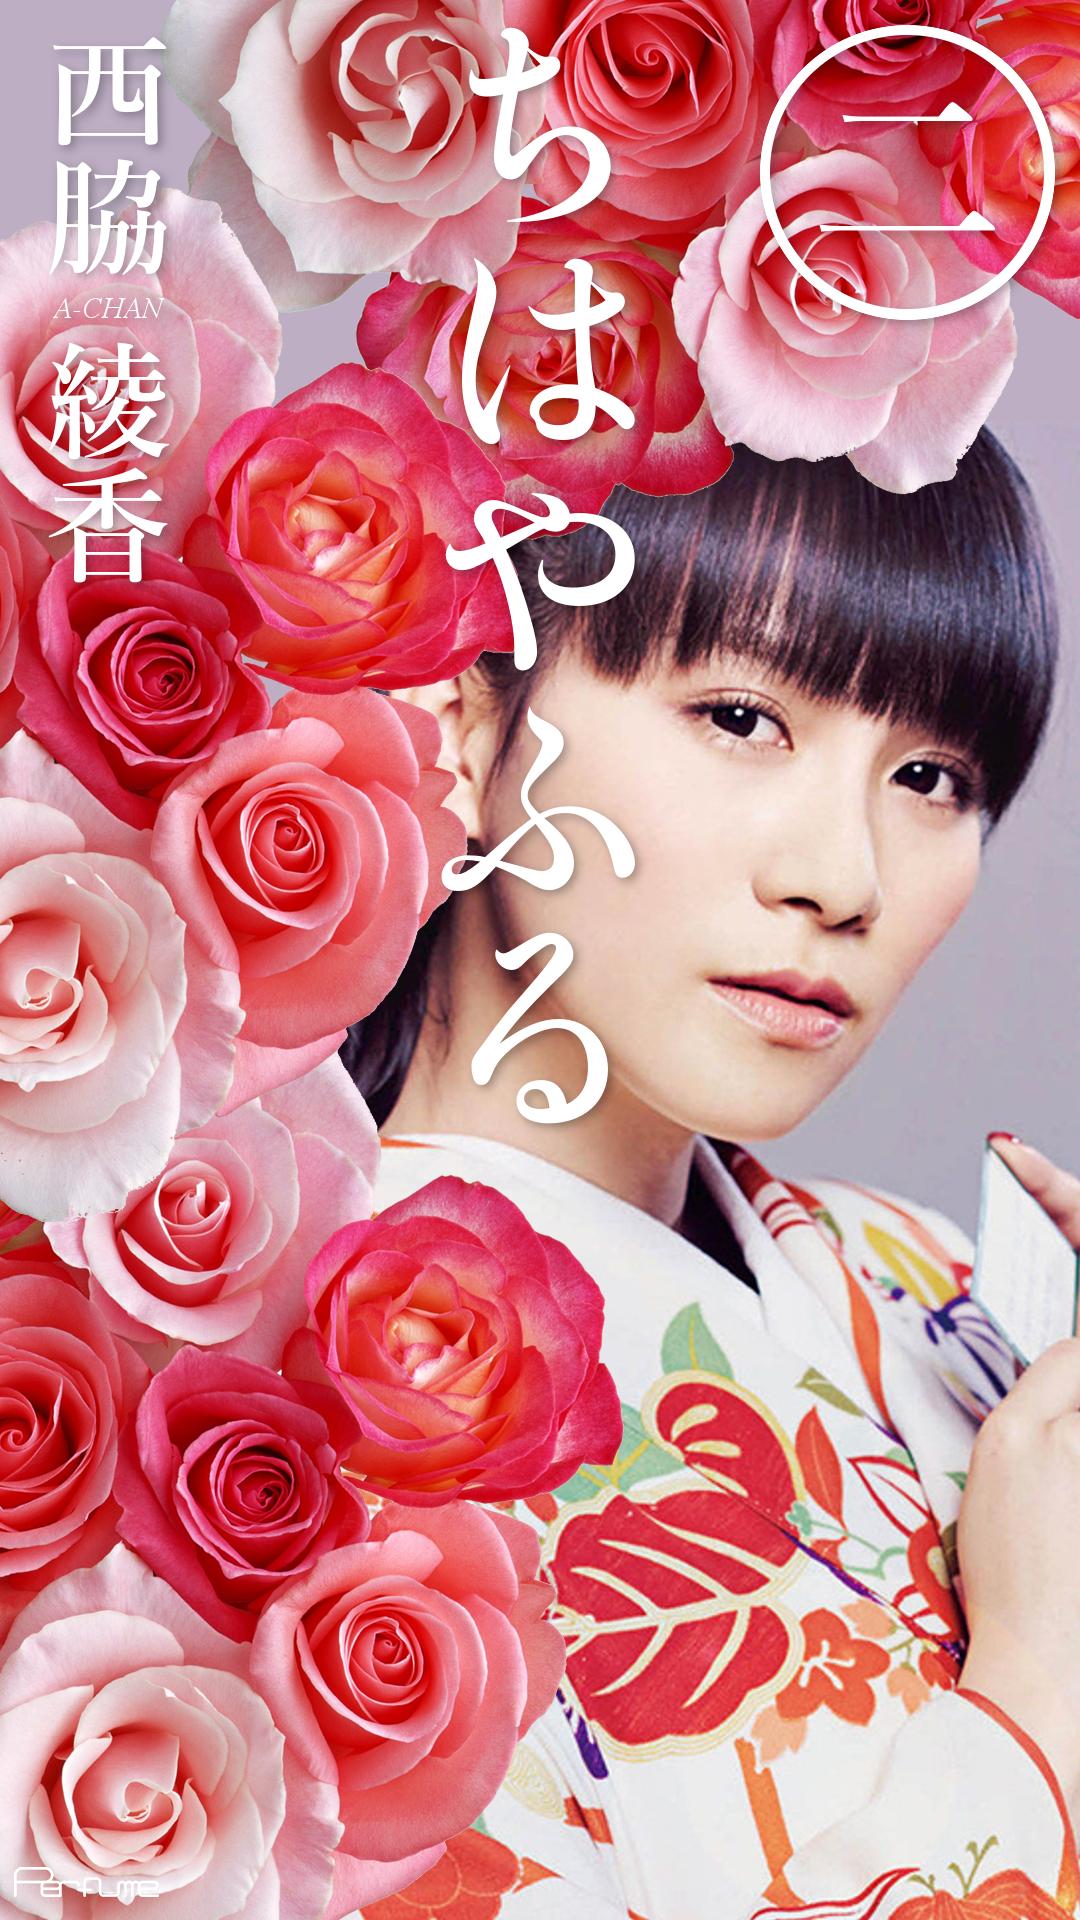 Sazae3 Perfume ちはやふる Perfume 壁紙 パヒューム Perfume のっち